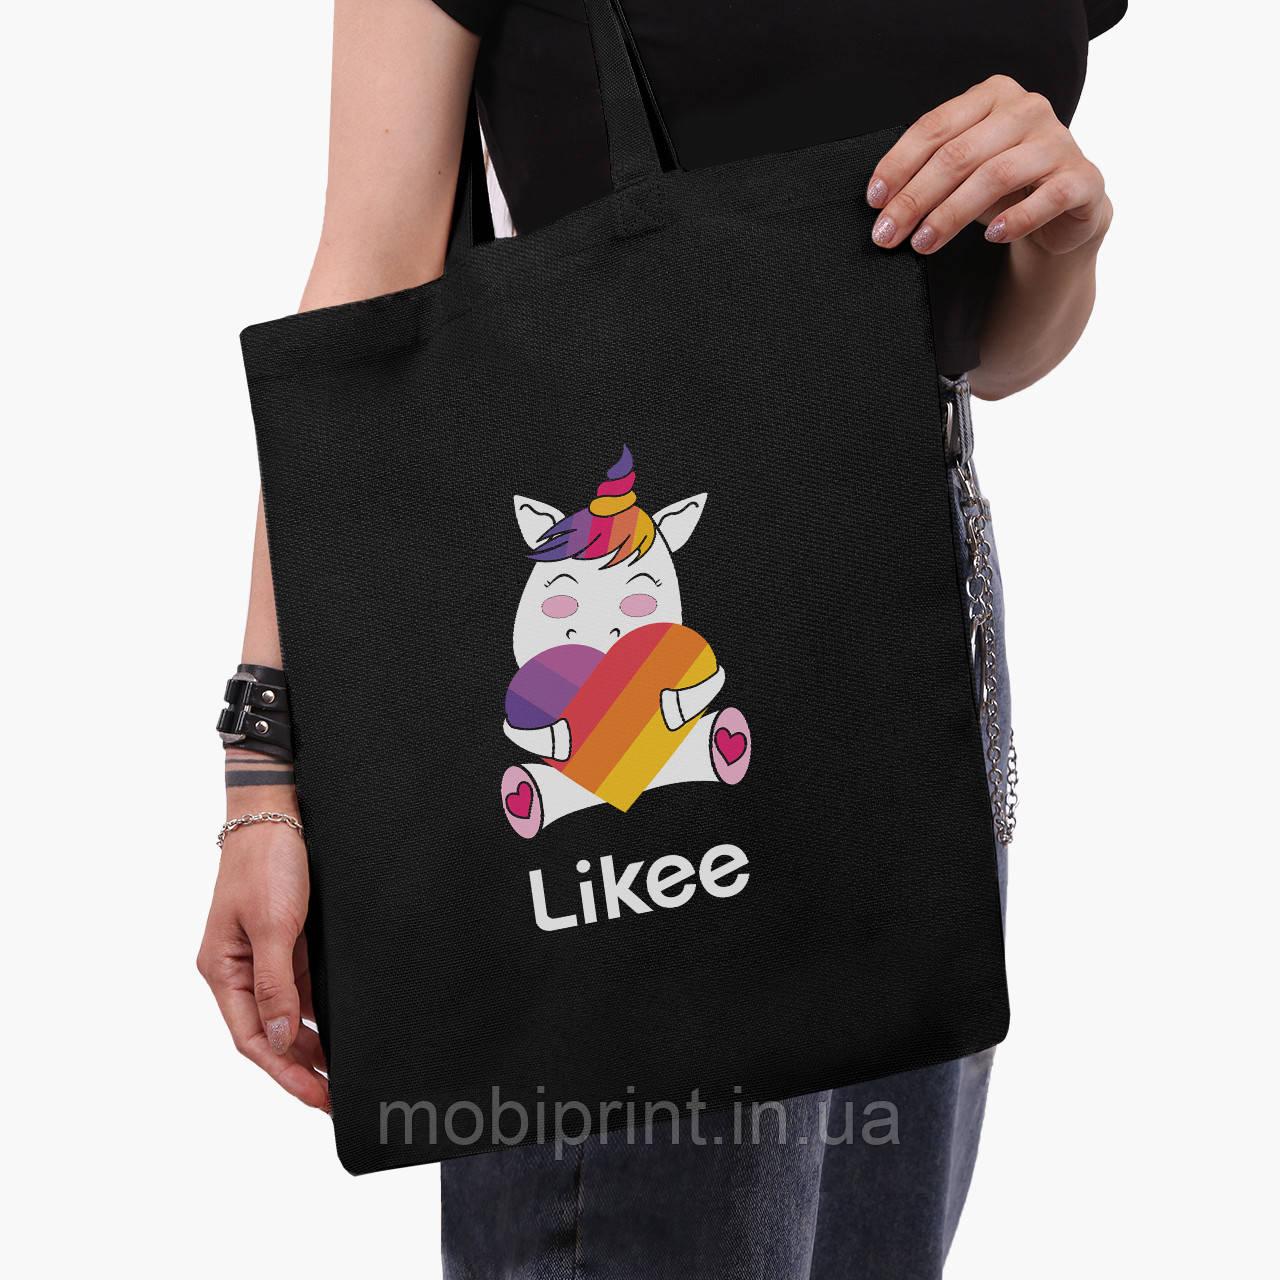 Еко сумка шоппер чорна Лайк Єдиноріг (Likee Unicorn) (9227-1037-2) екосумка шопер 41*35 см